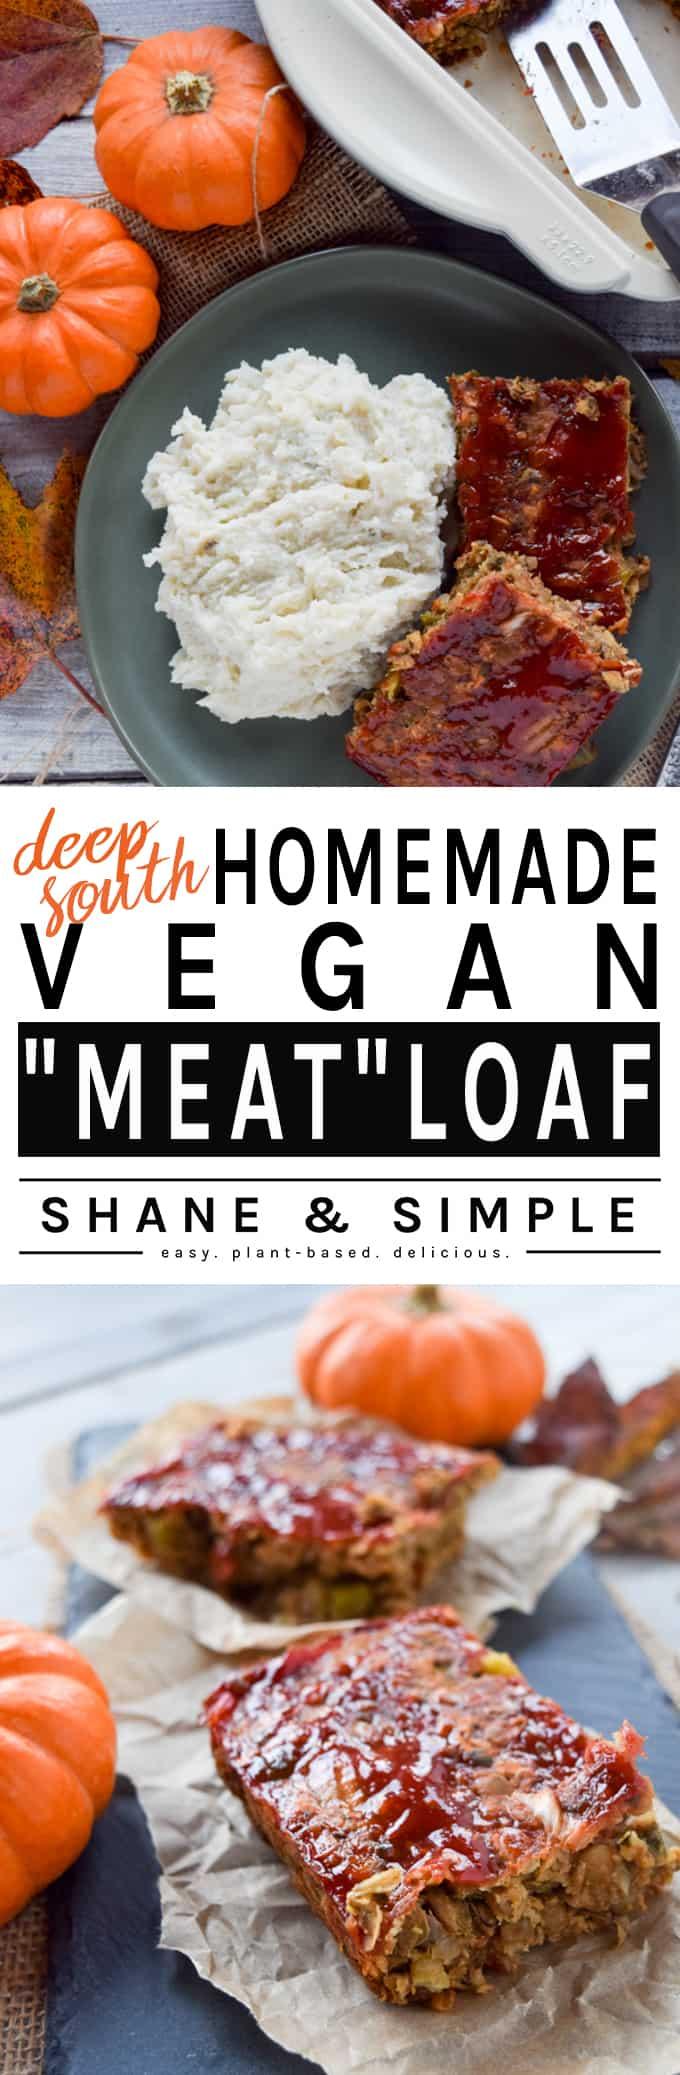 Deep South Homemade Vegan Meatloaf